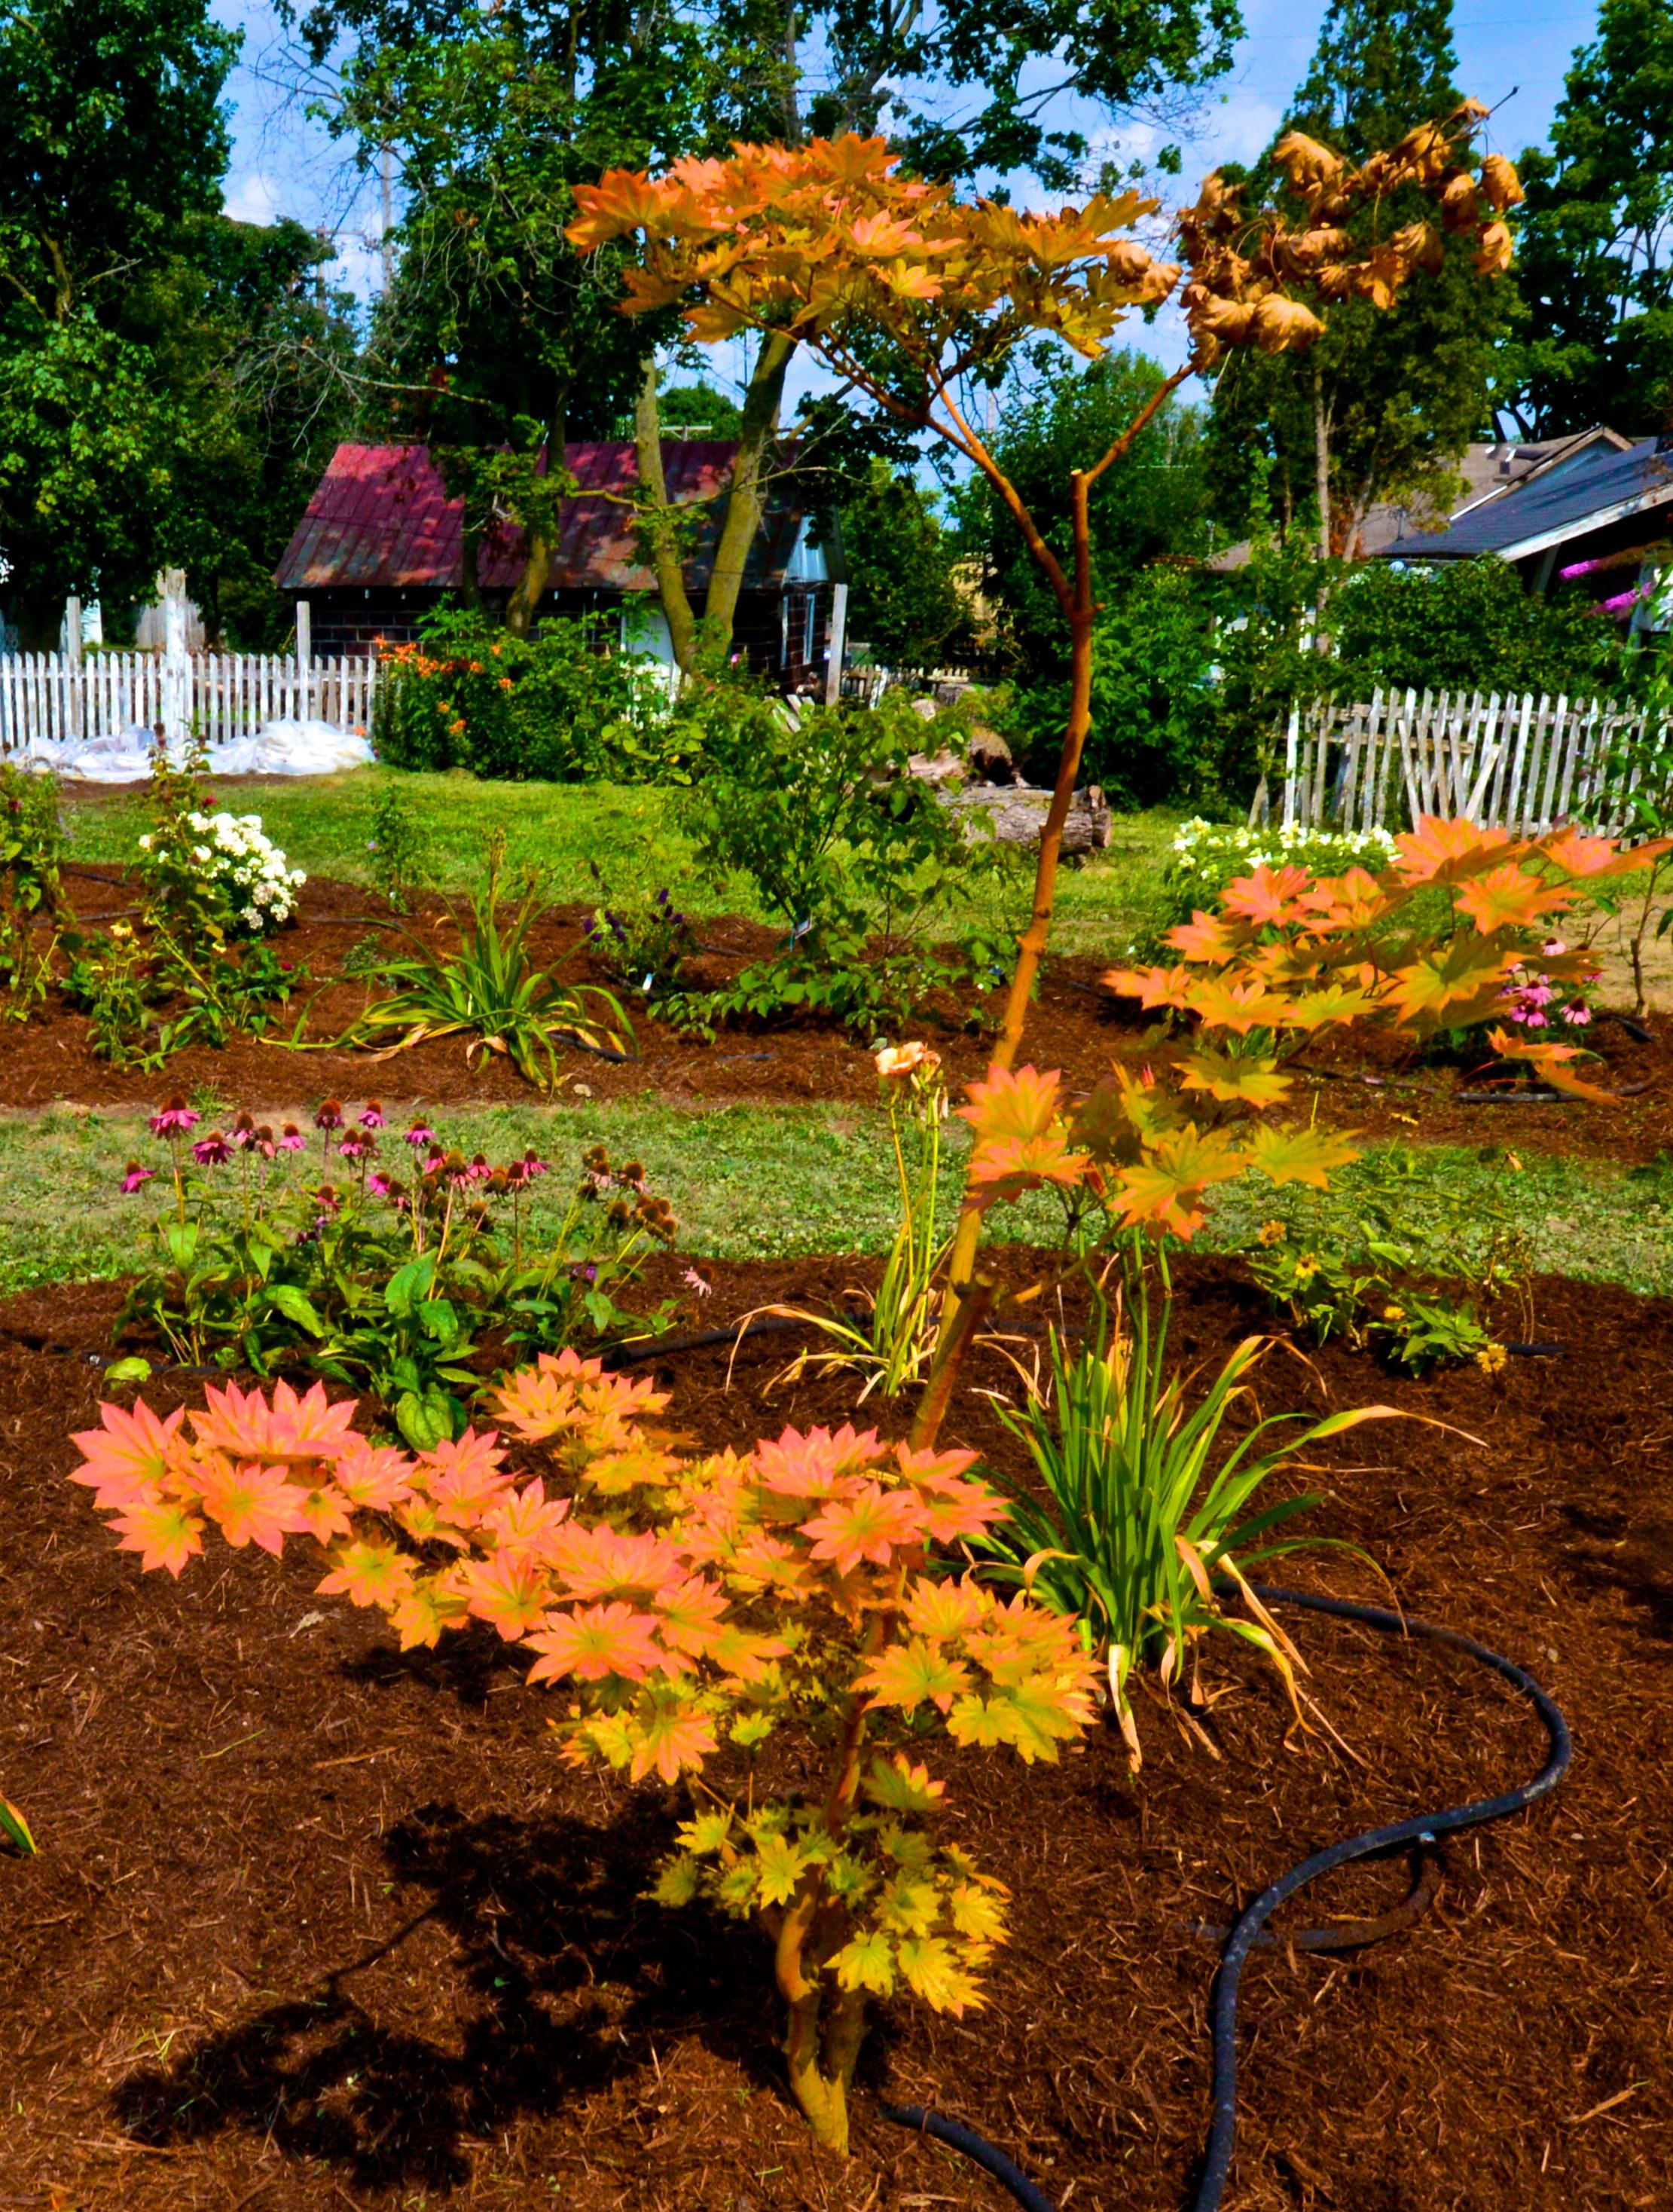 2014-08-02  Gardens 8 2 2014 (3).jpg